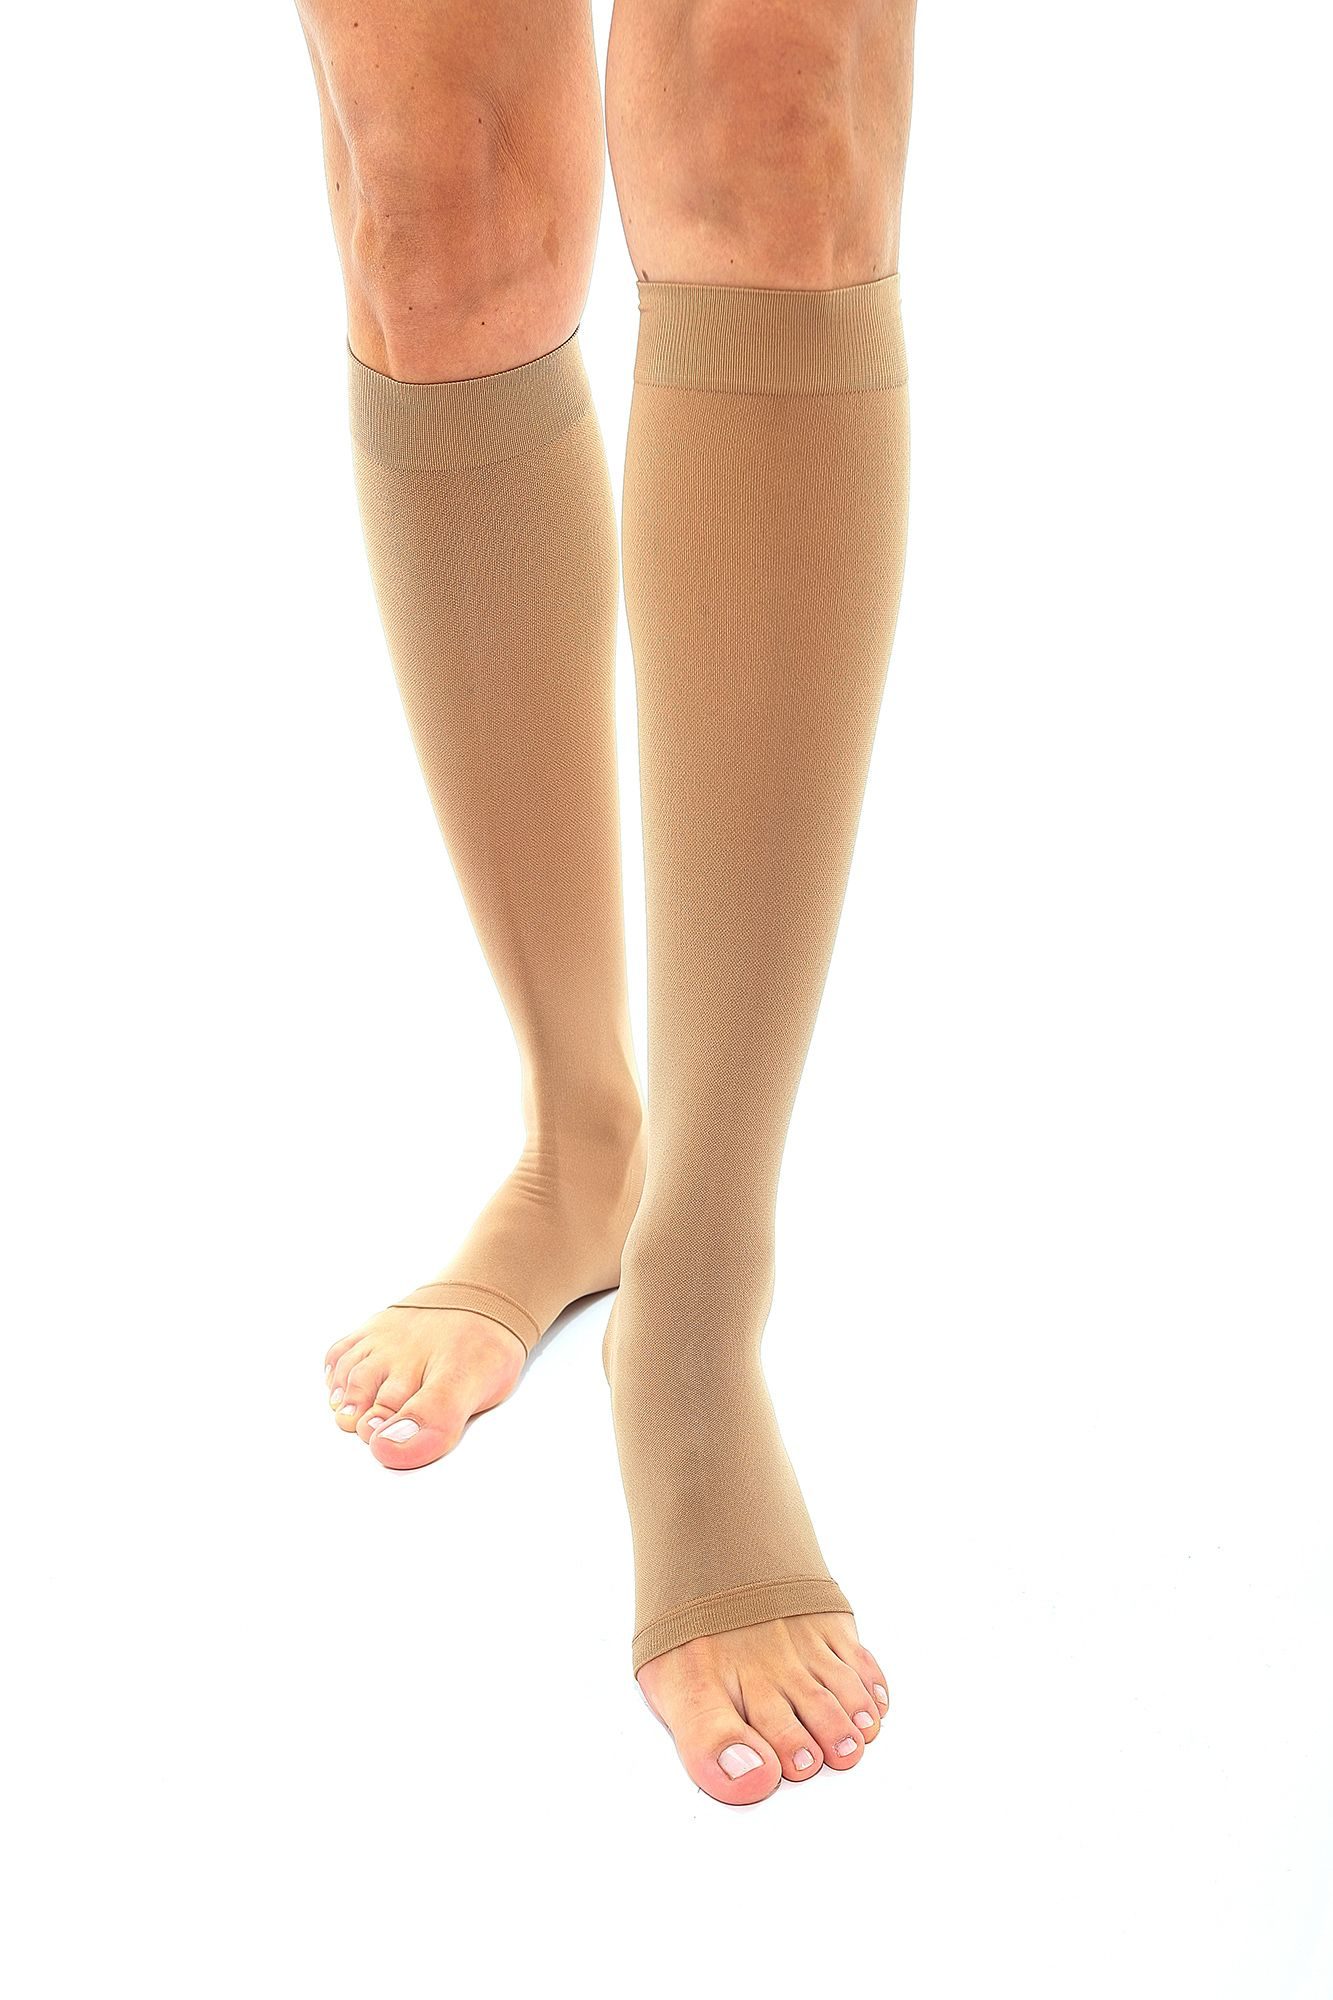 4ce3cdee425aa0 Credalast Nylon Class 3 Below Knee Compression Stockings - Daylong